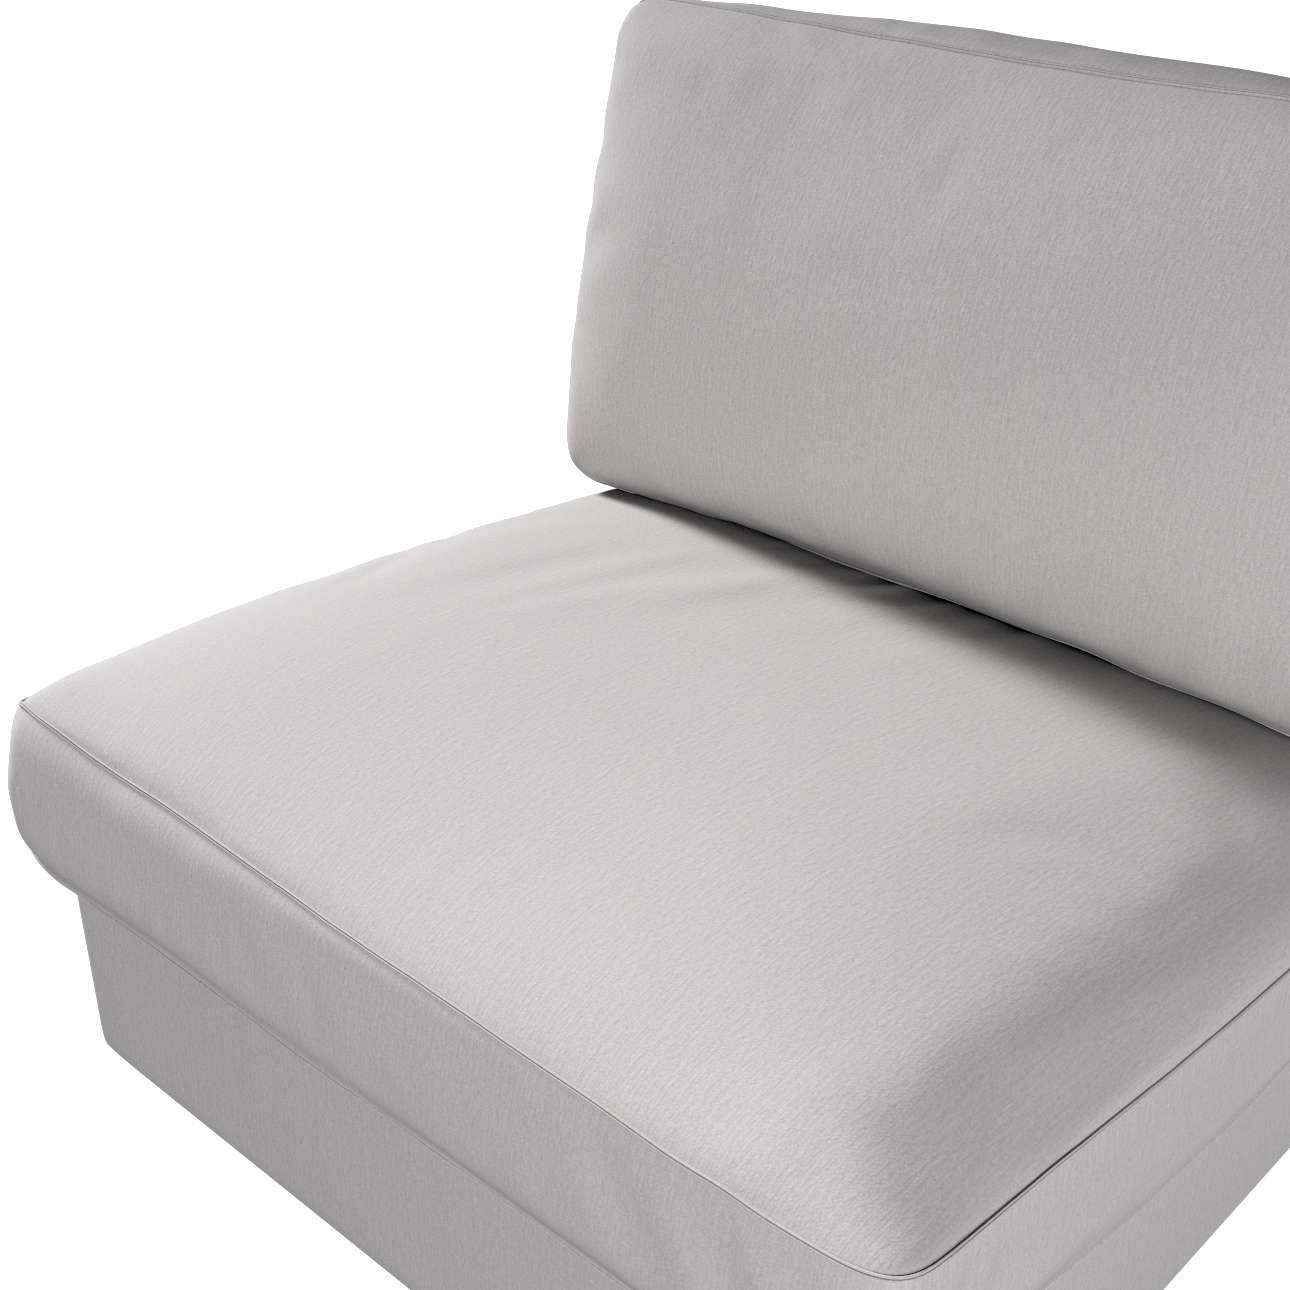 Pokrowiec na fotel Kivik w kolekcji Chenille, tkanina: 702-23